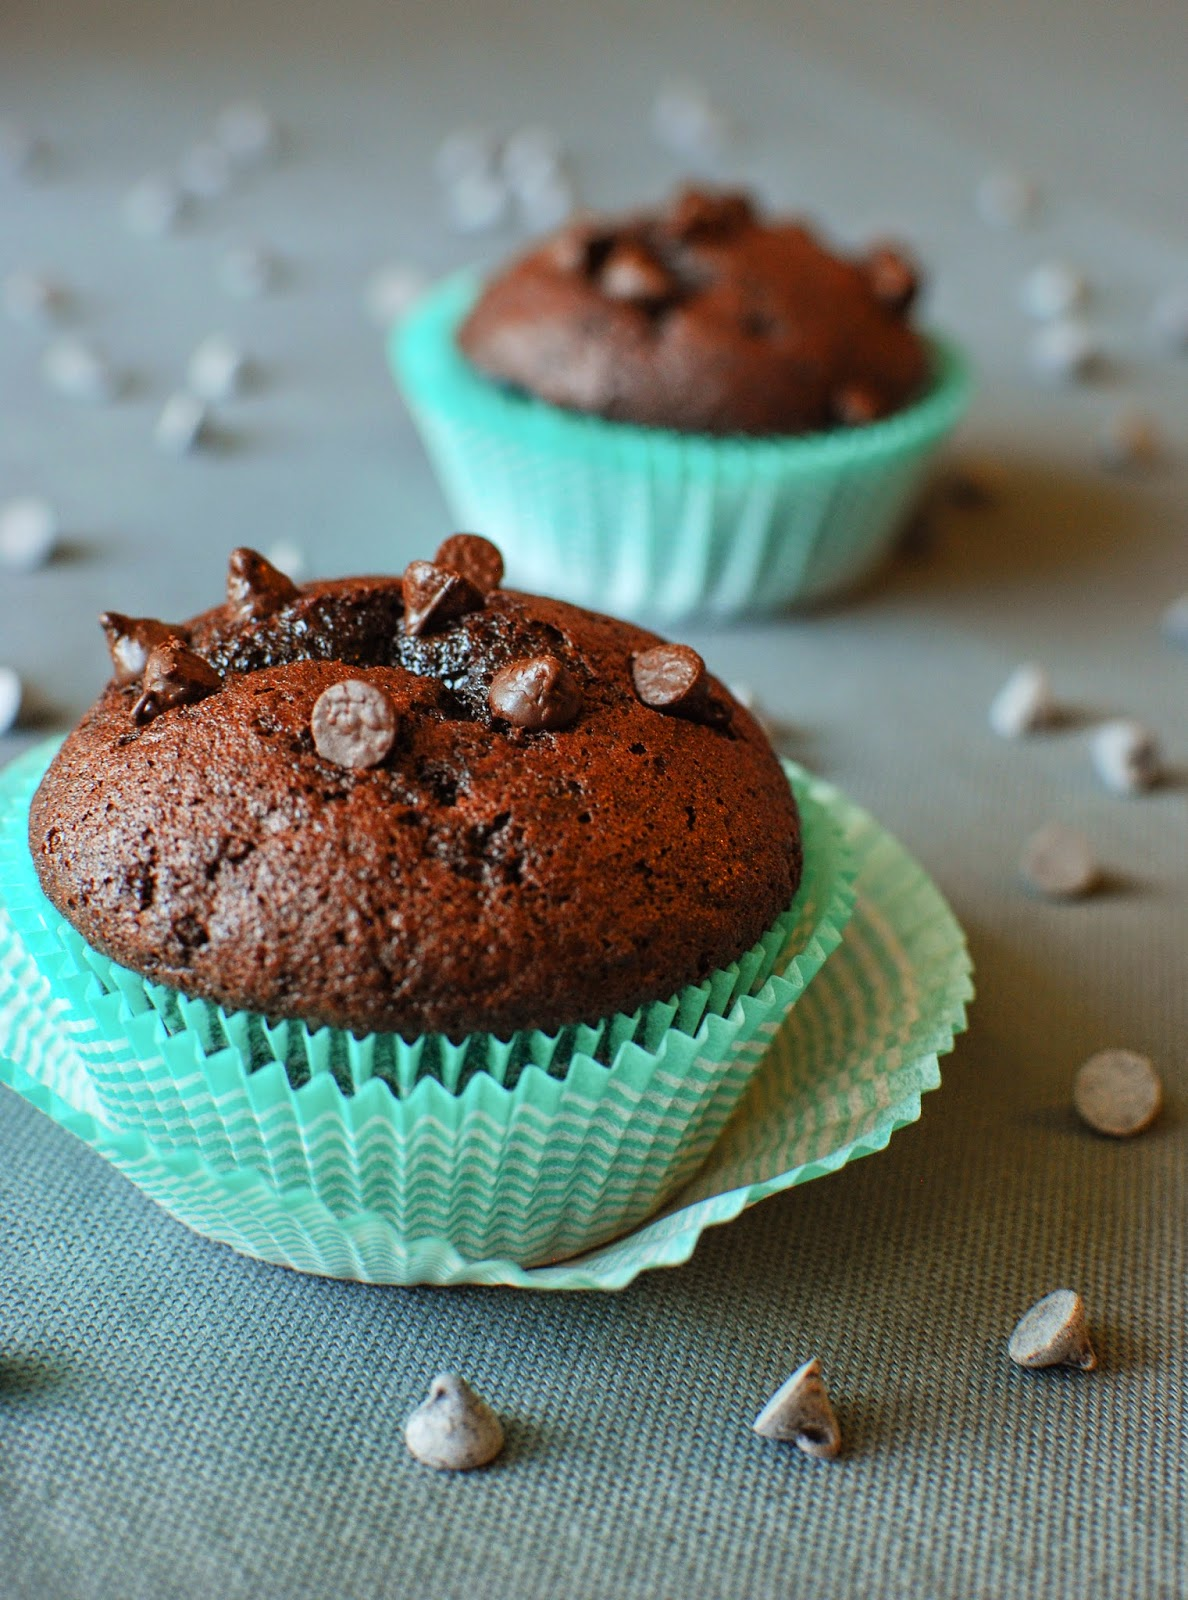 http://invitationaufaitmaison.blogspot.fr/2014/04/muffins-tout-choco.html